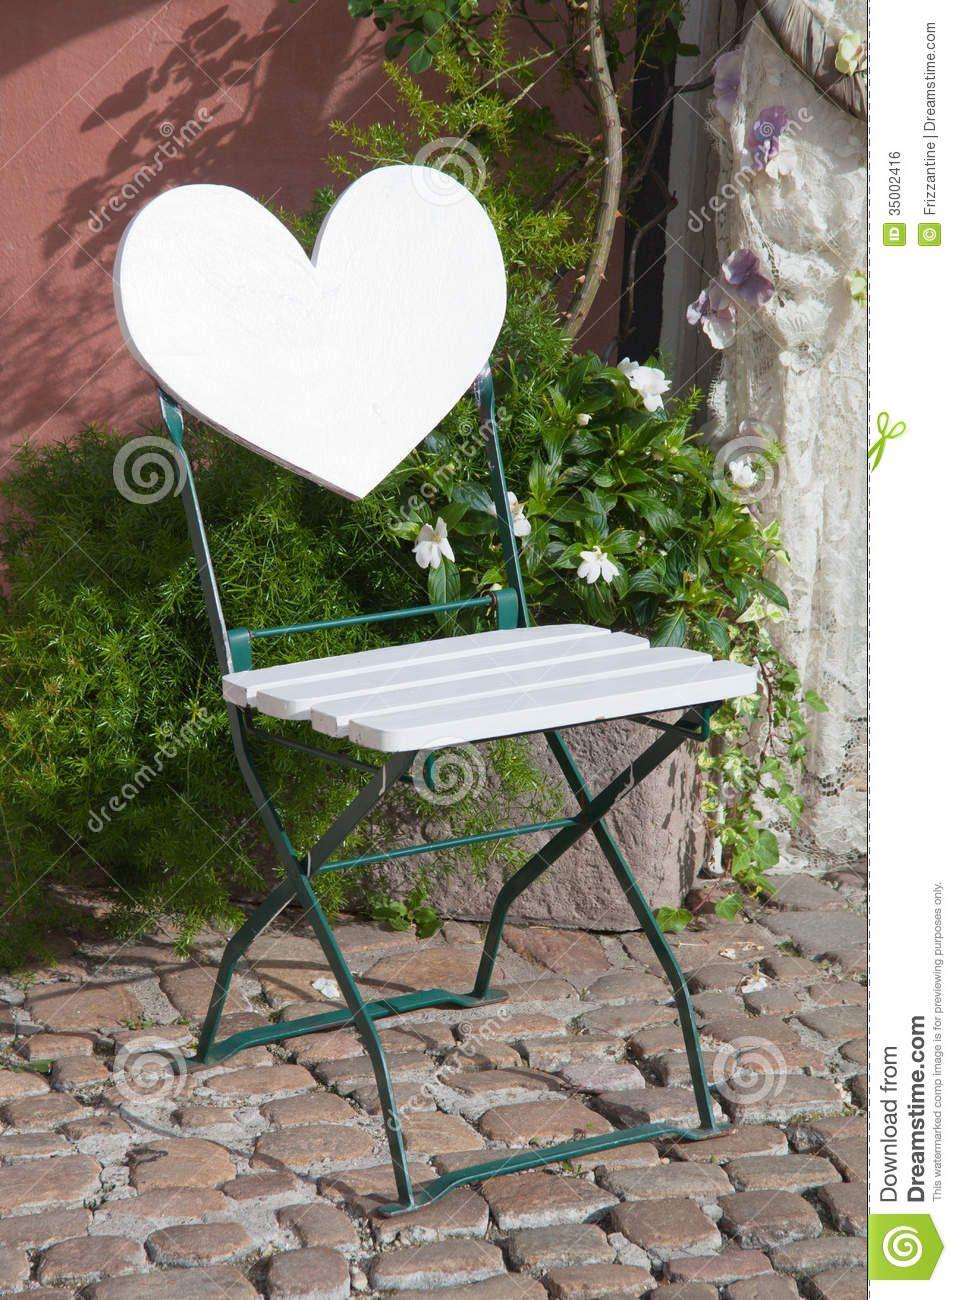 Garden Chair With Heart Shape Backrest On Cobblestone With Flowe Patio Landscaping Garden Patio Furniture Luxury Garden Furniture